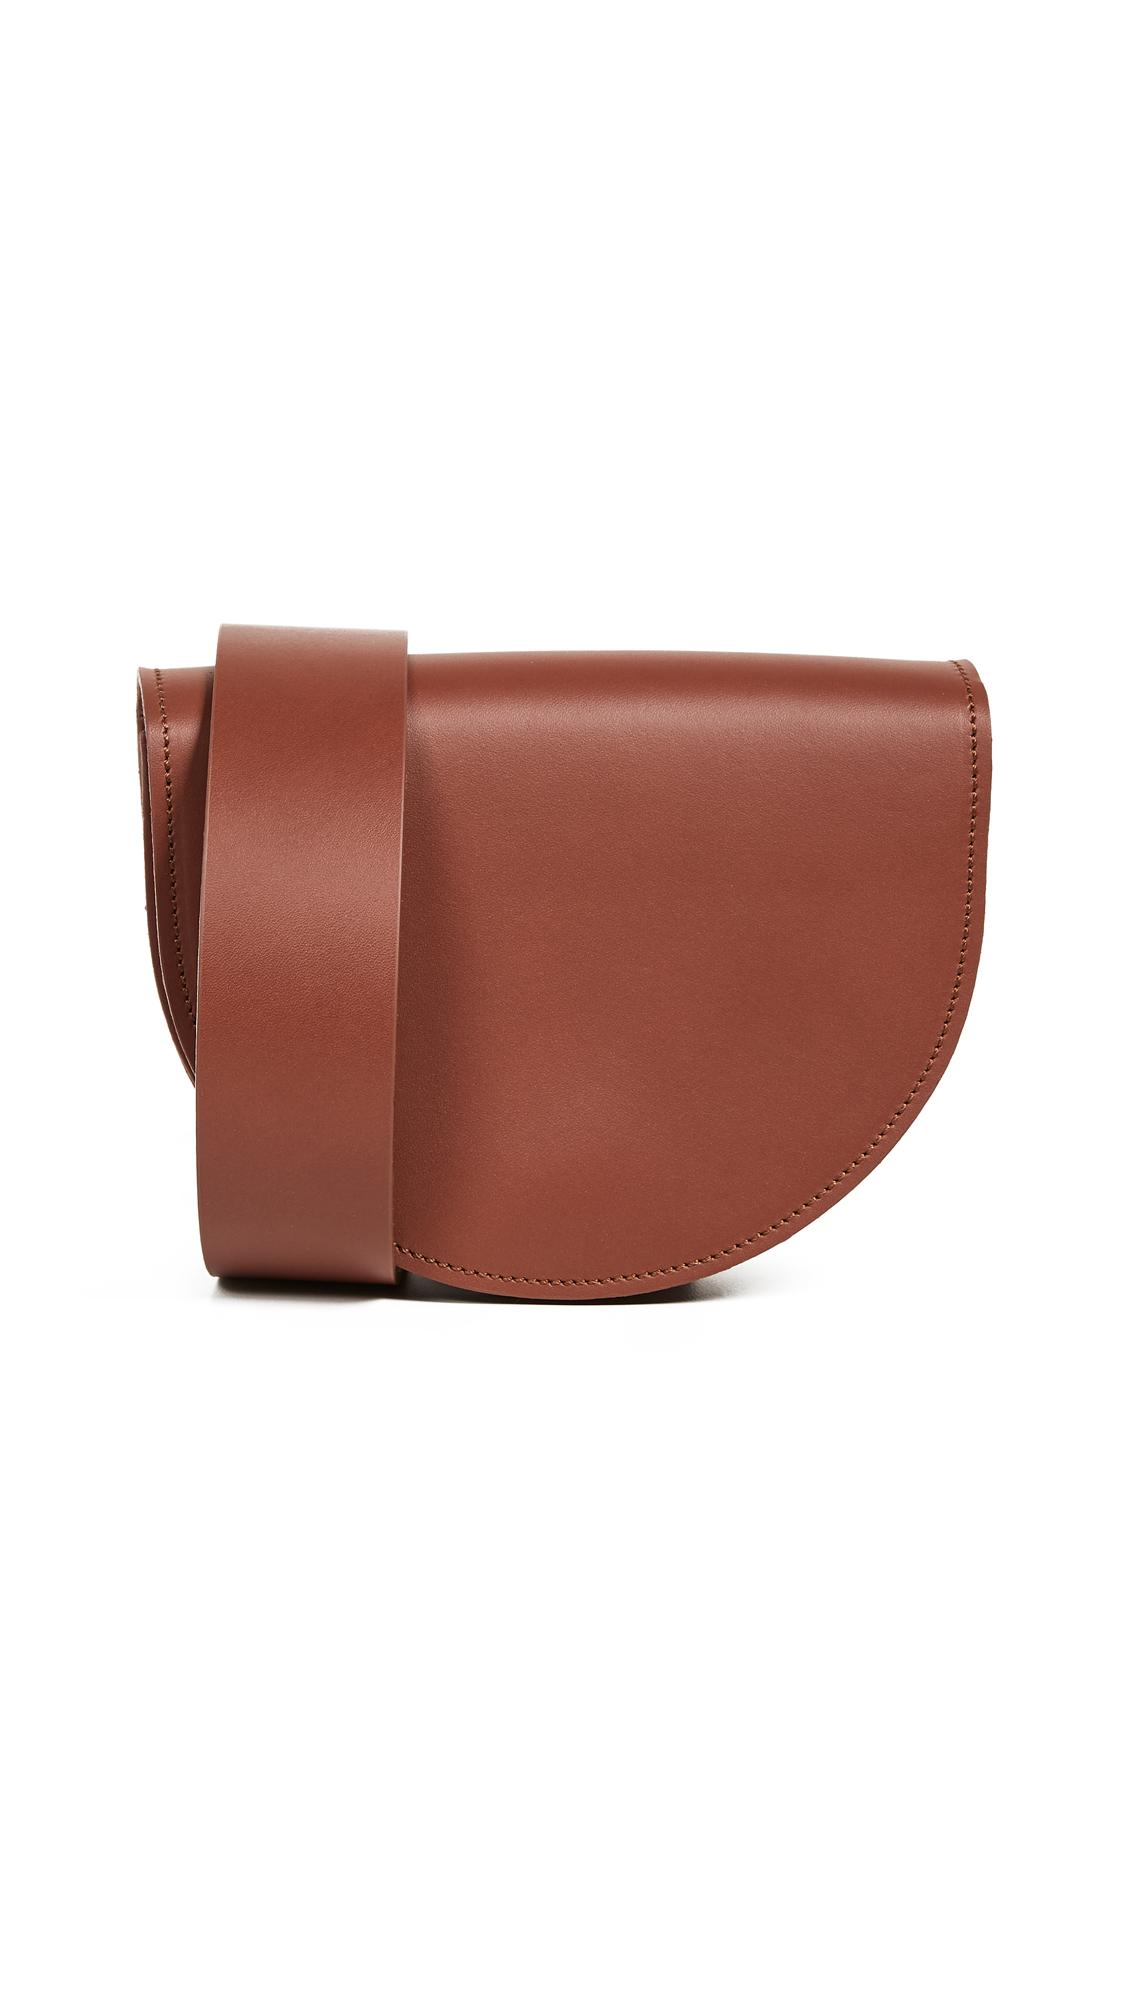 VEREVERTO Luna Belt Bag in Brown